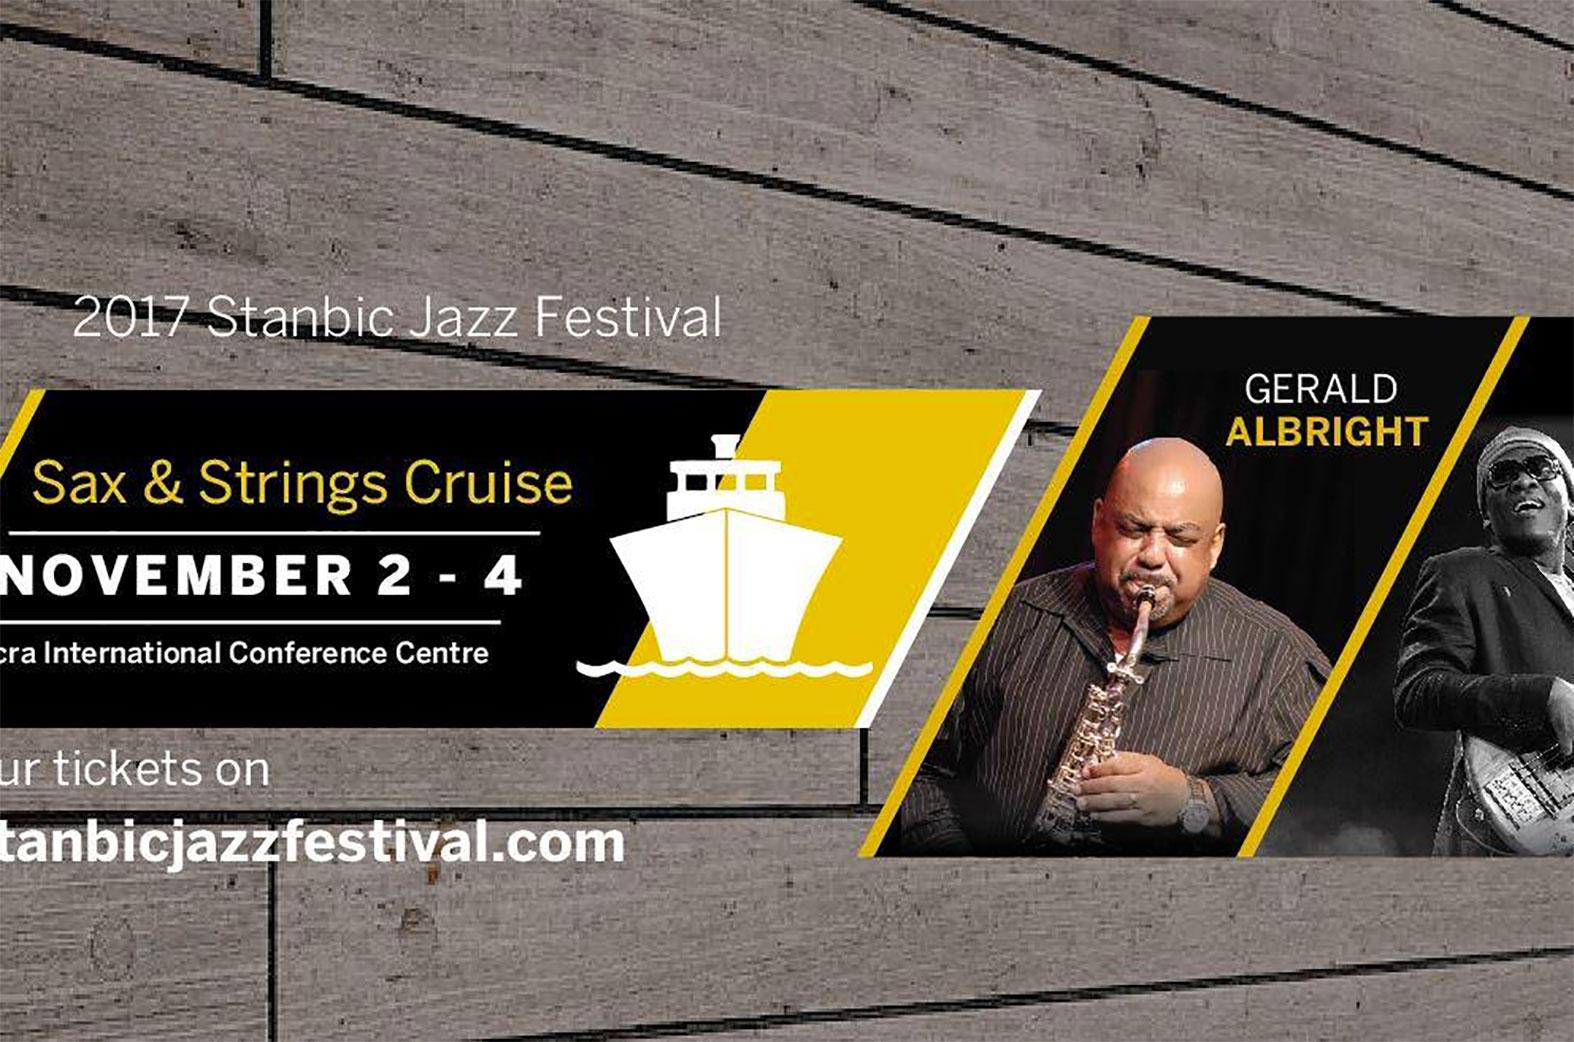 Stanbic Jazz Festival 2017